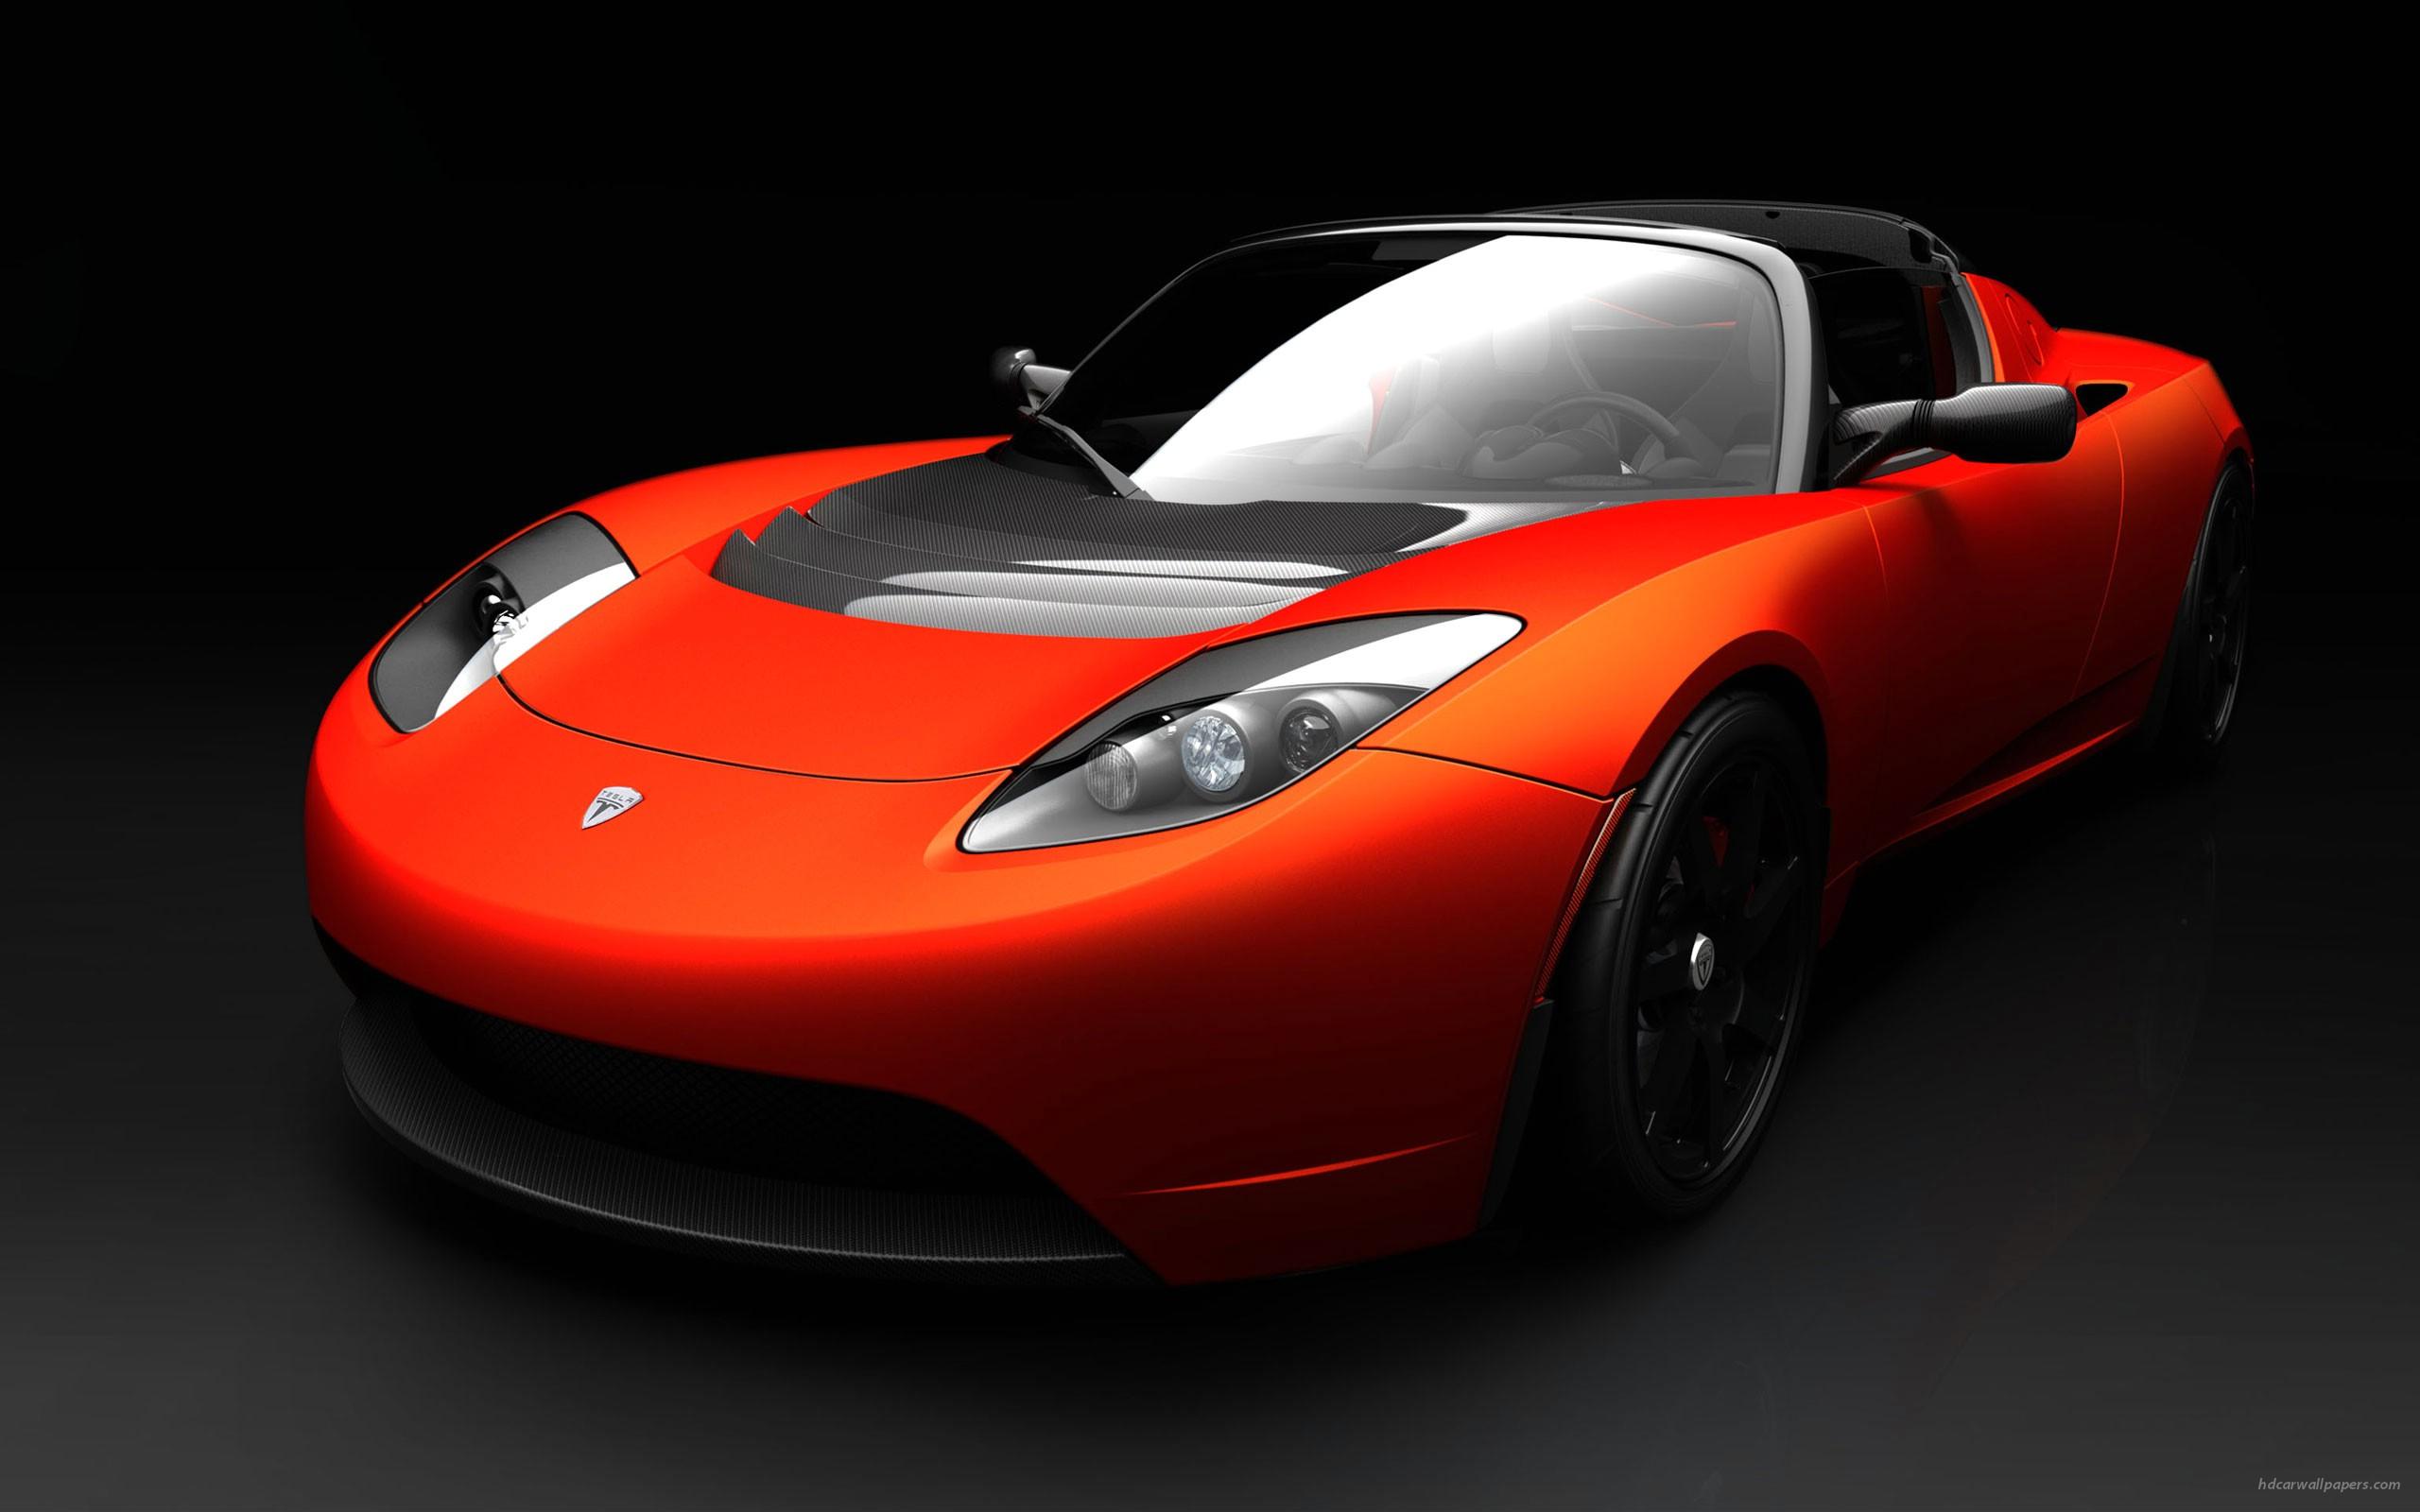 Tesla Roadster Sports Car Wallpapers HD Wallpapers 2560x1600